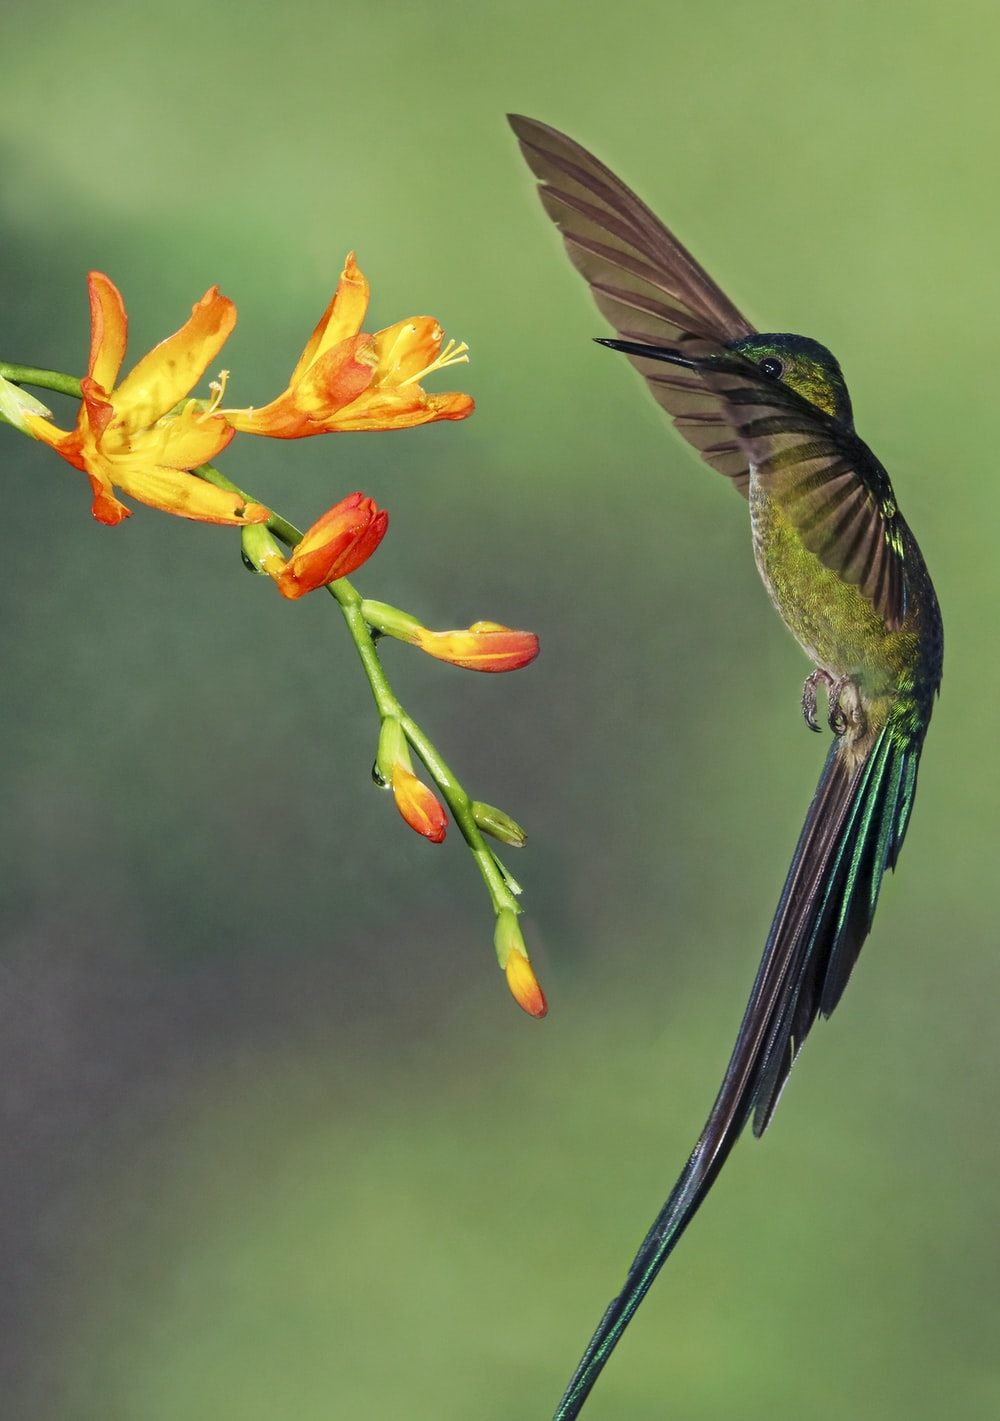 macro photography of bird and flower